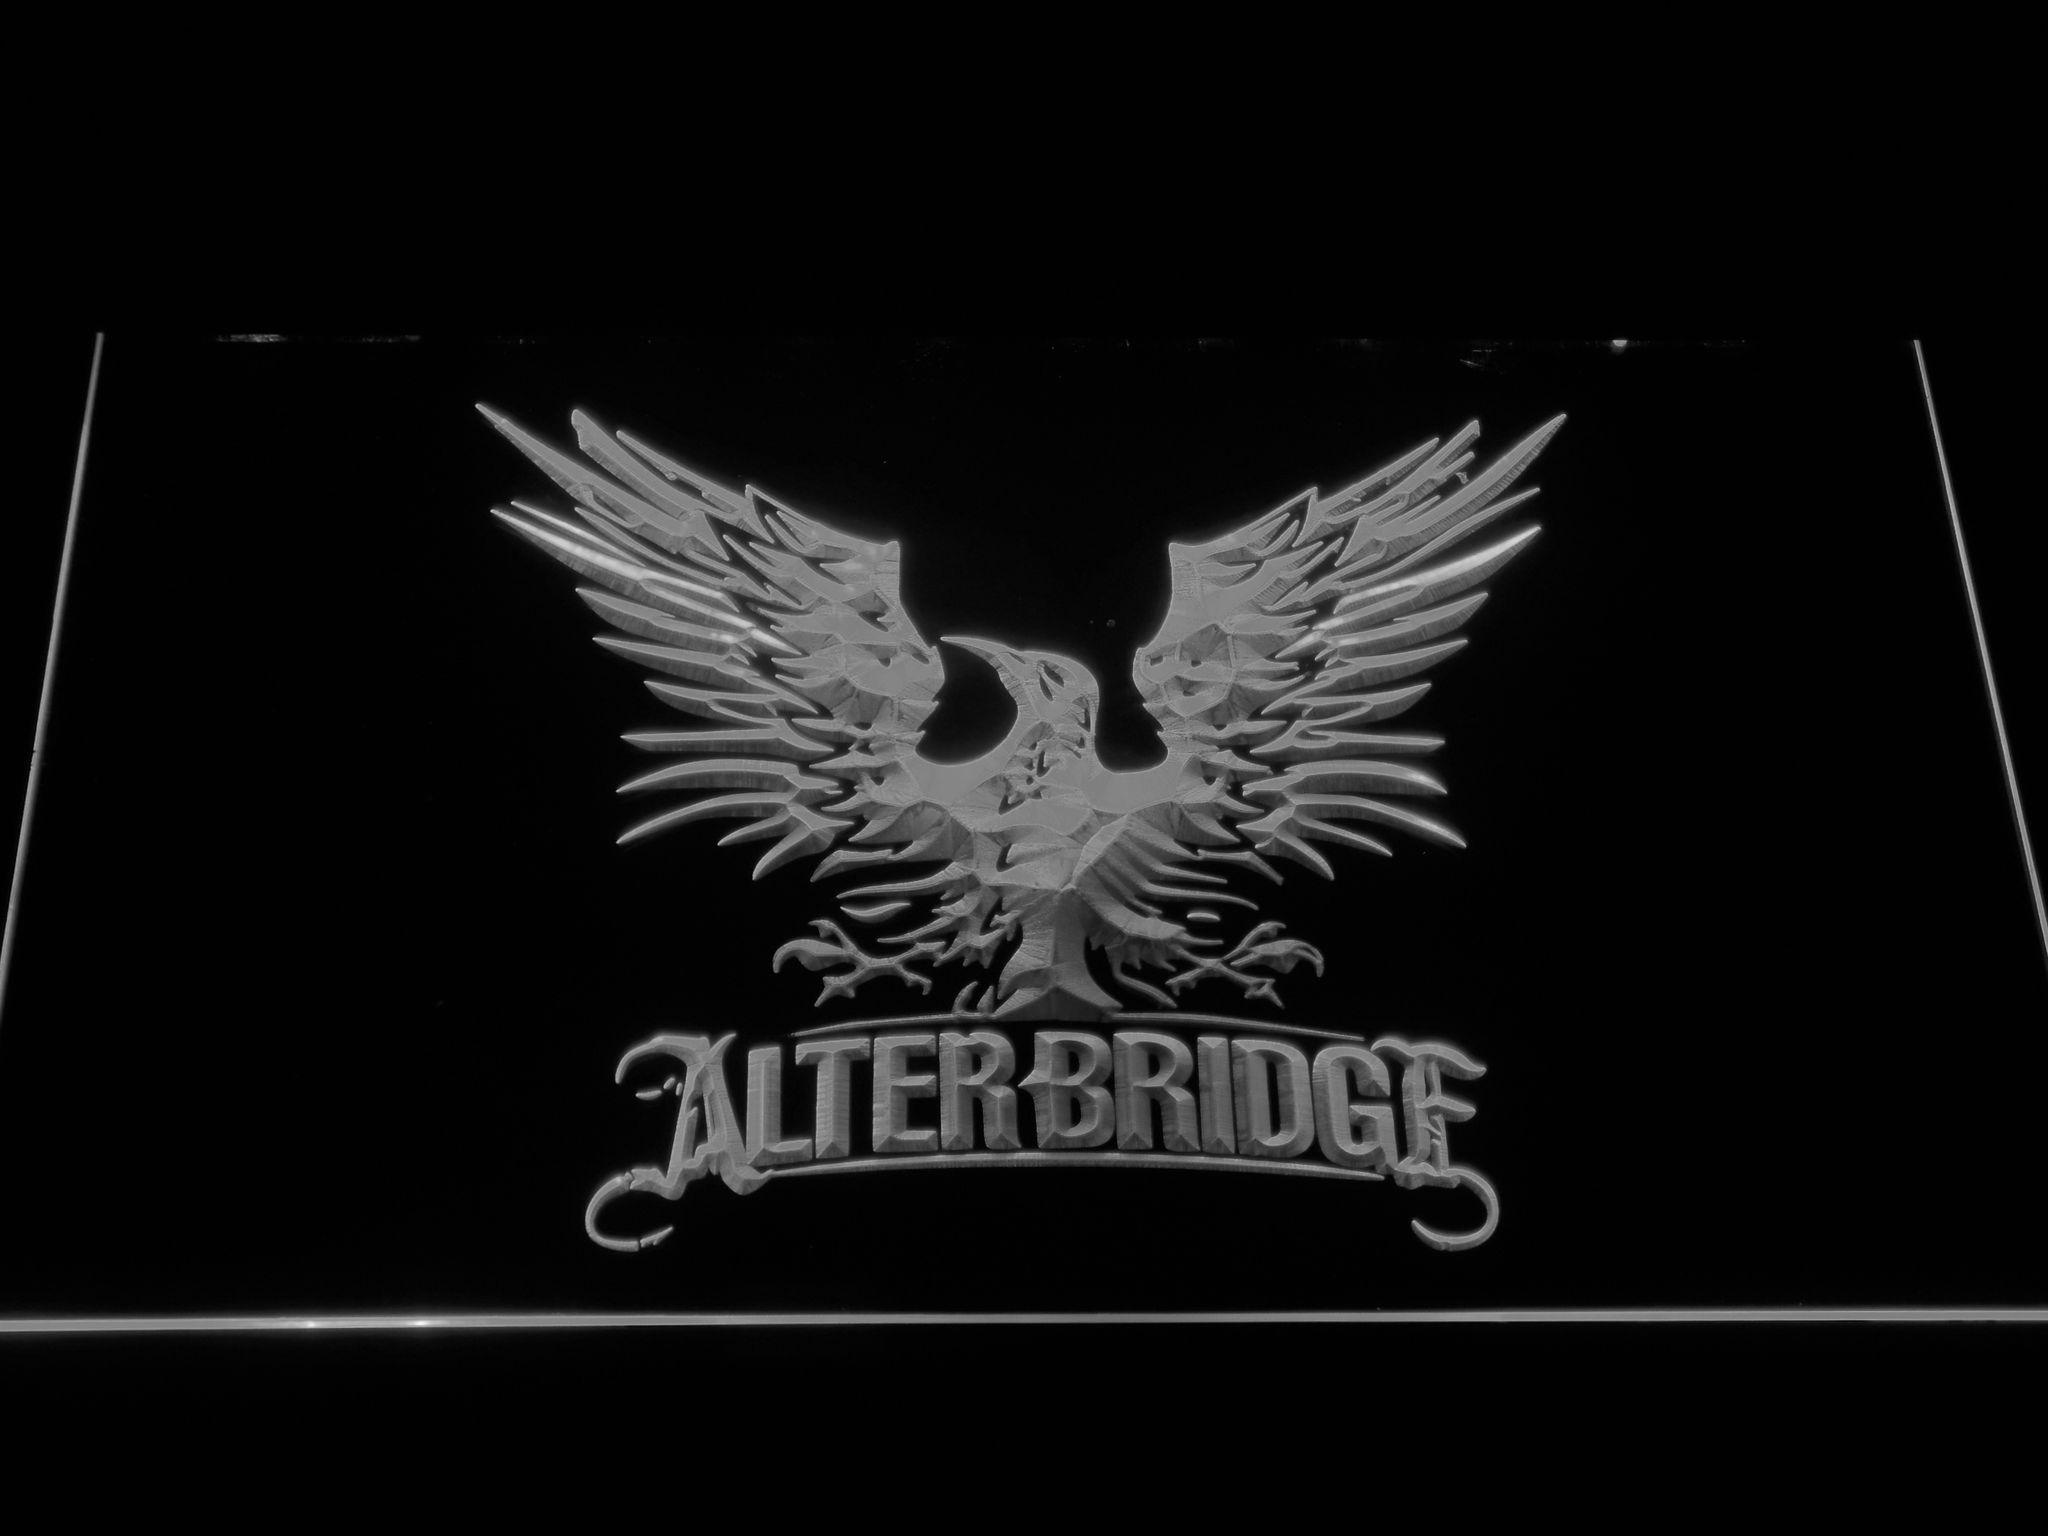 Alter Bridge Blackbird Wallpapers Wallpaper Cave